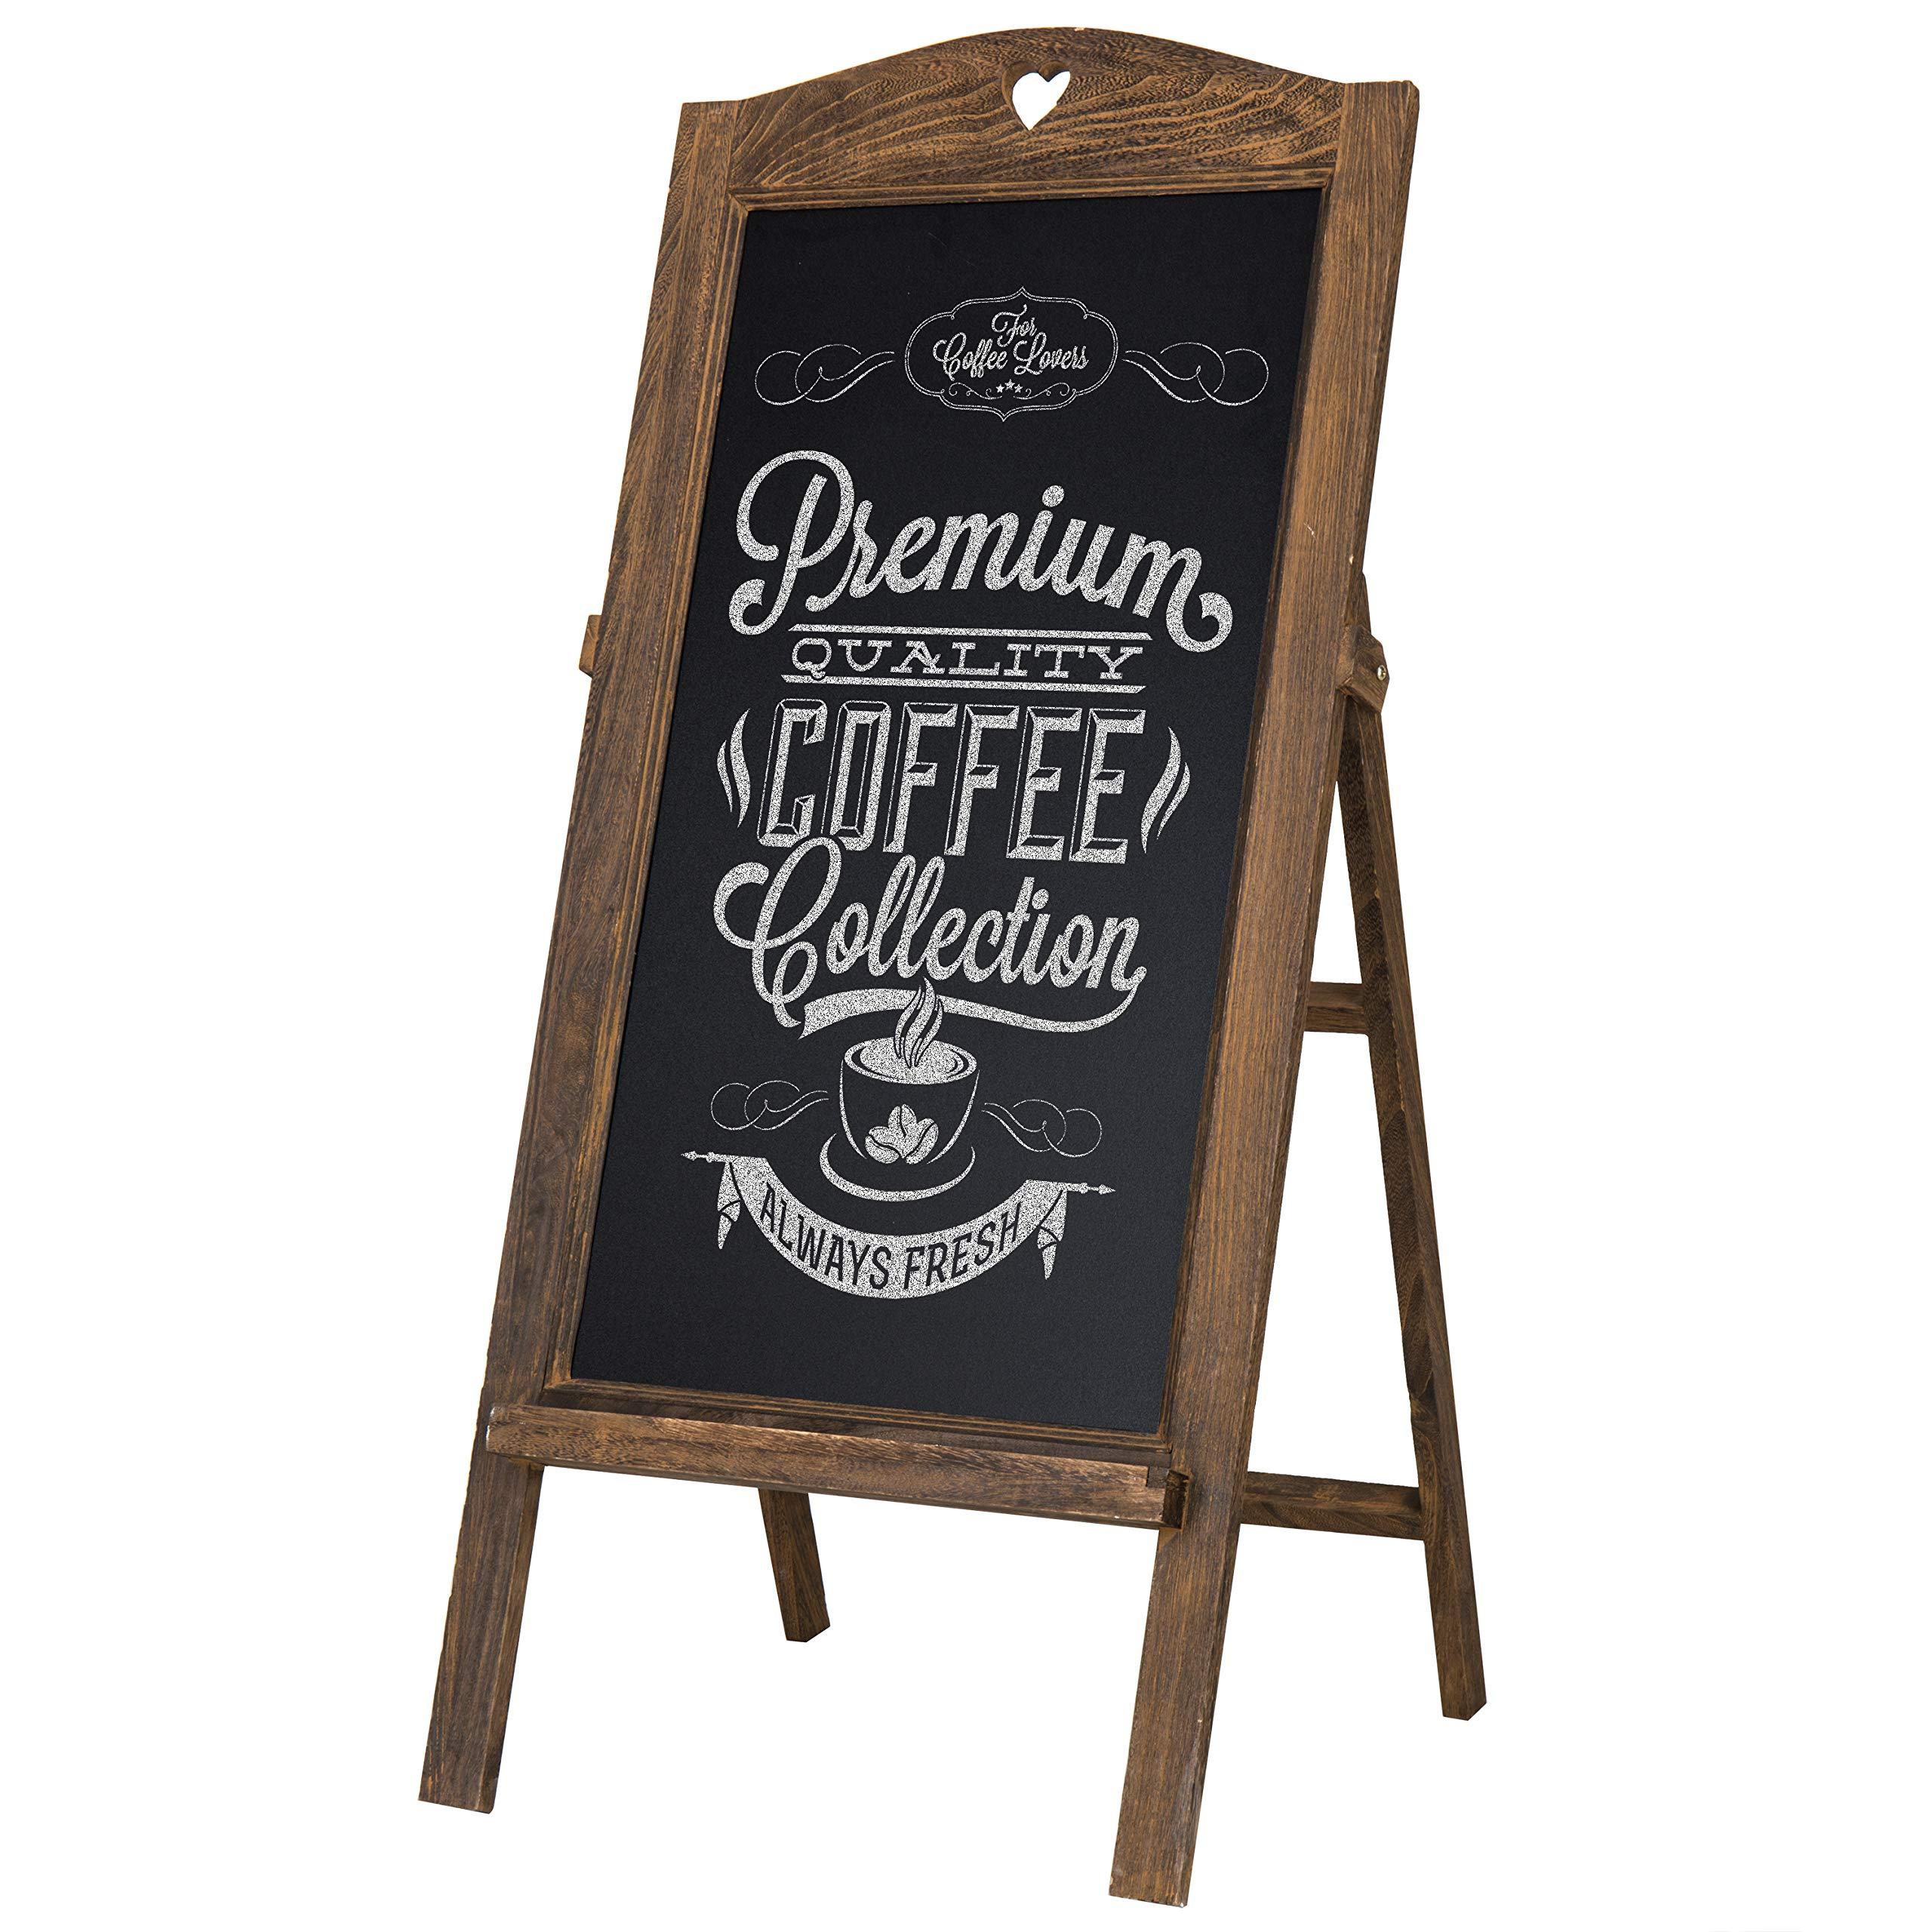 MyGift 26-Inch Freestanding Chalkboard with Vintage Brown Wood Frame